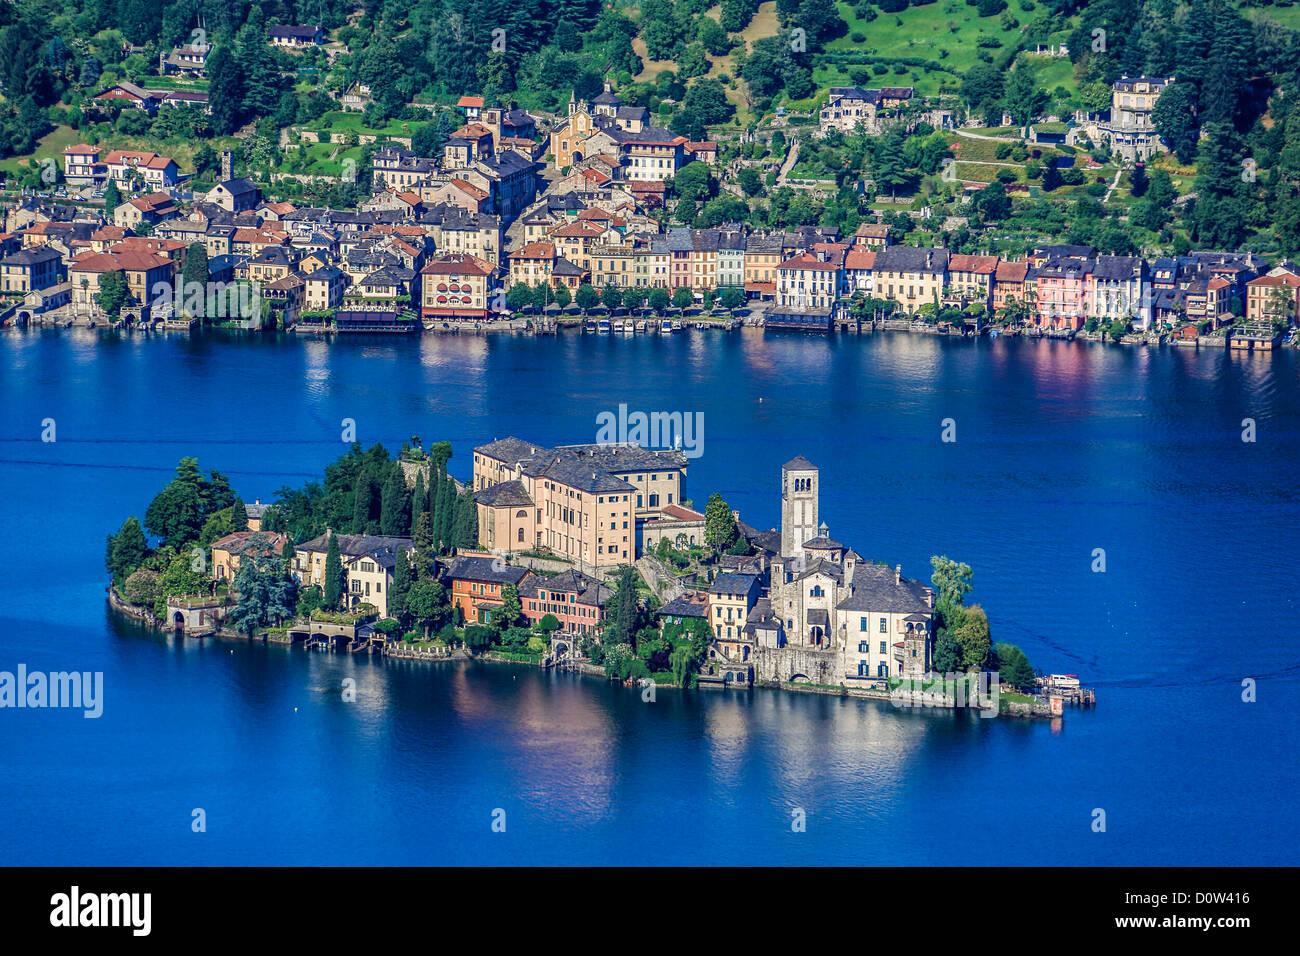 Italien, Europa, Reisen, Orta See, San Vigno, Insel, Piemont, Dächer, Wald, Tourismus, Stadt, Stockbild